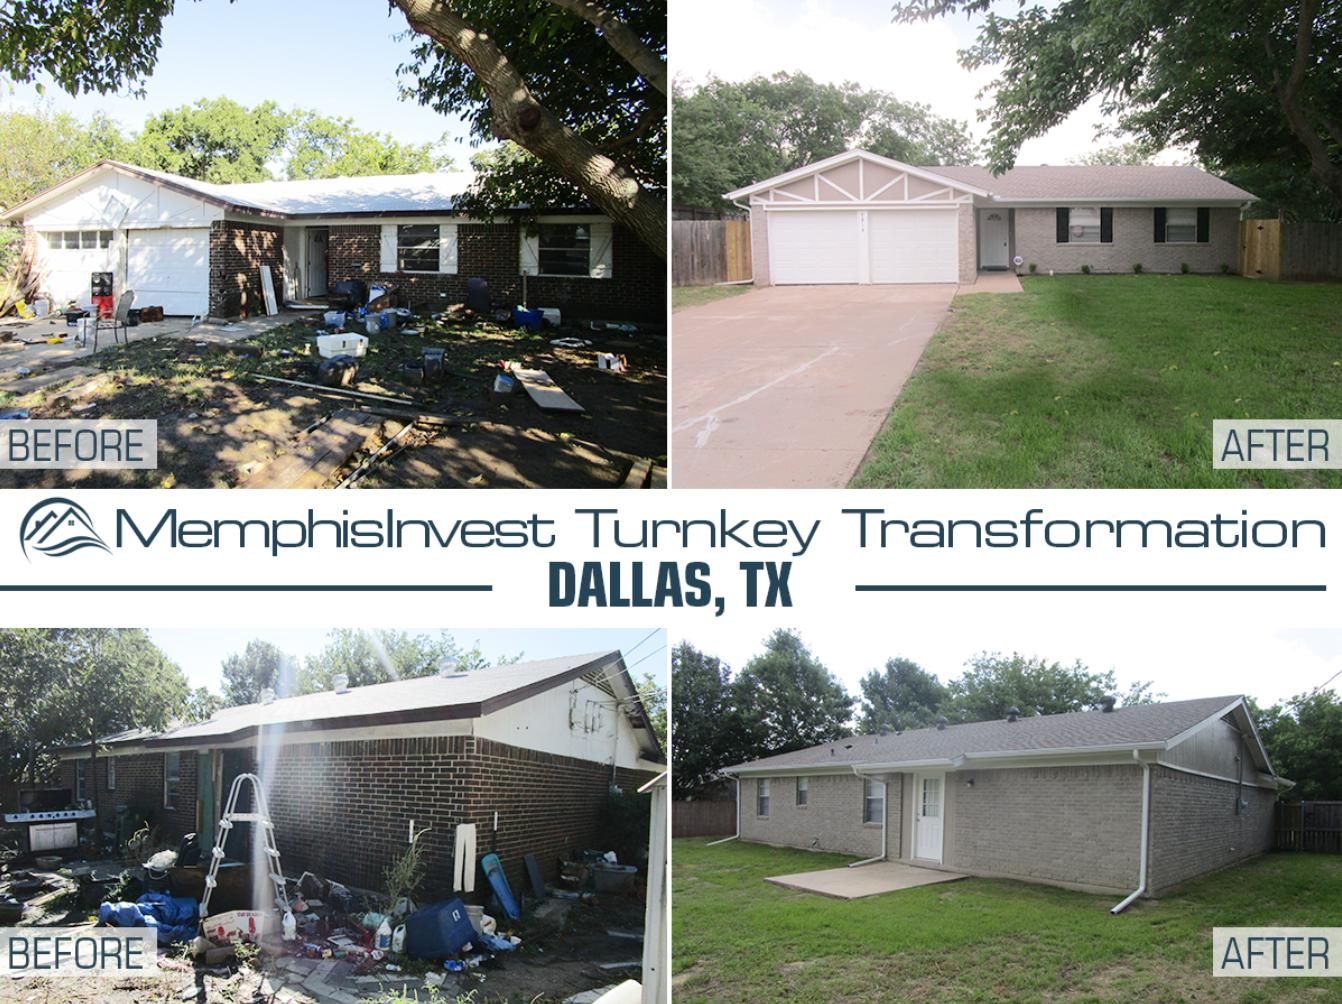 Dallas_Turnkey_Transformation